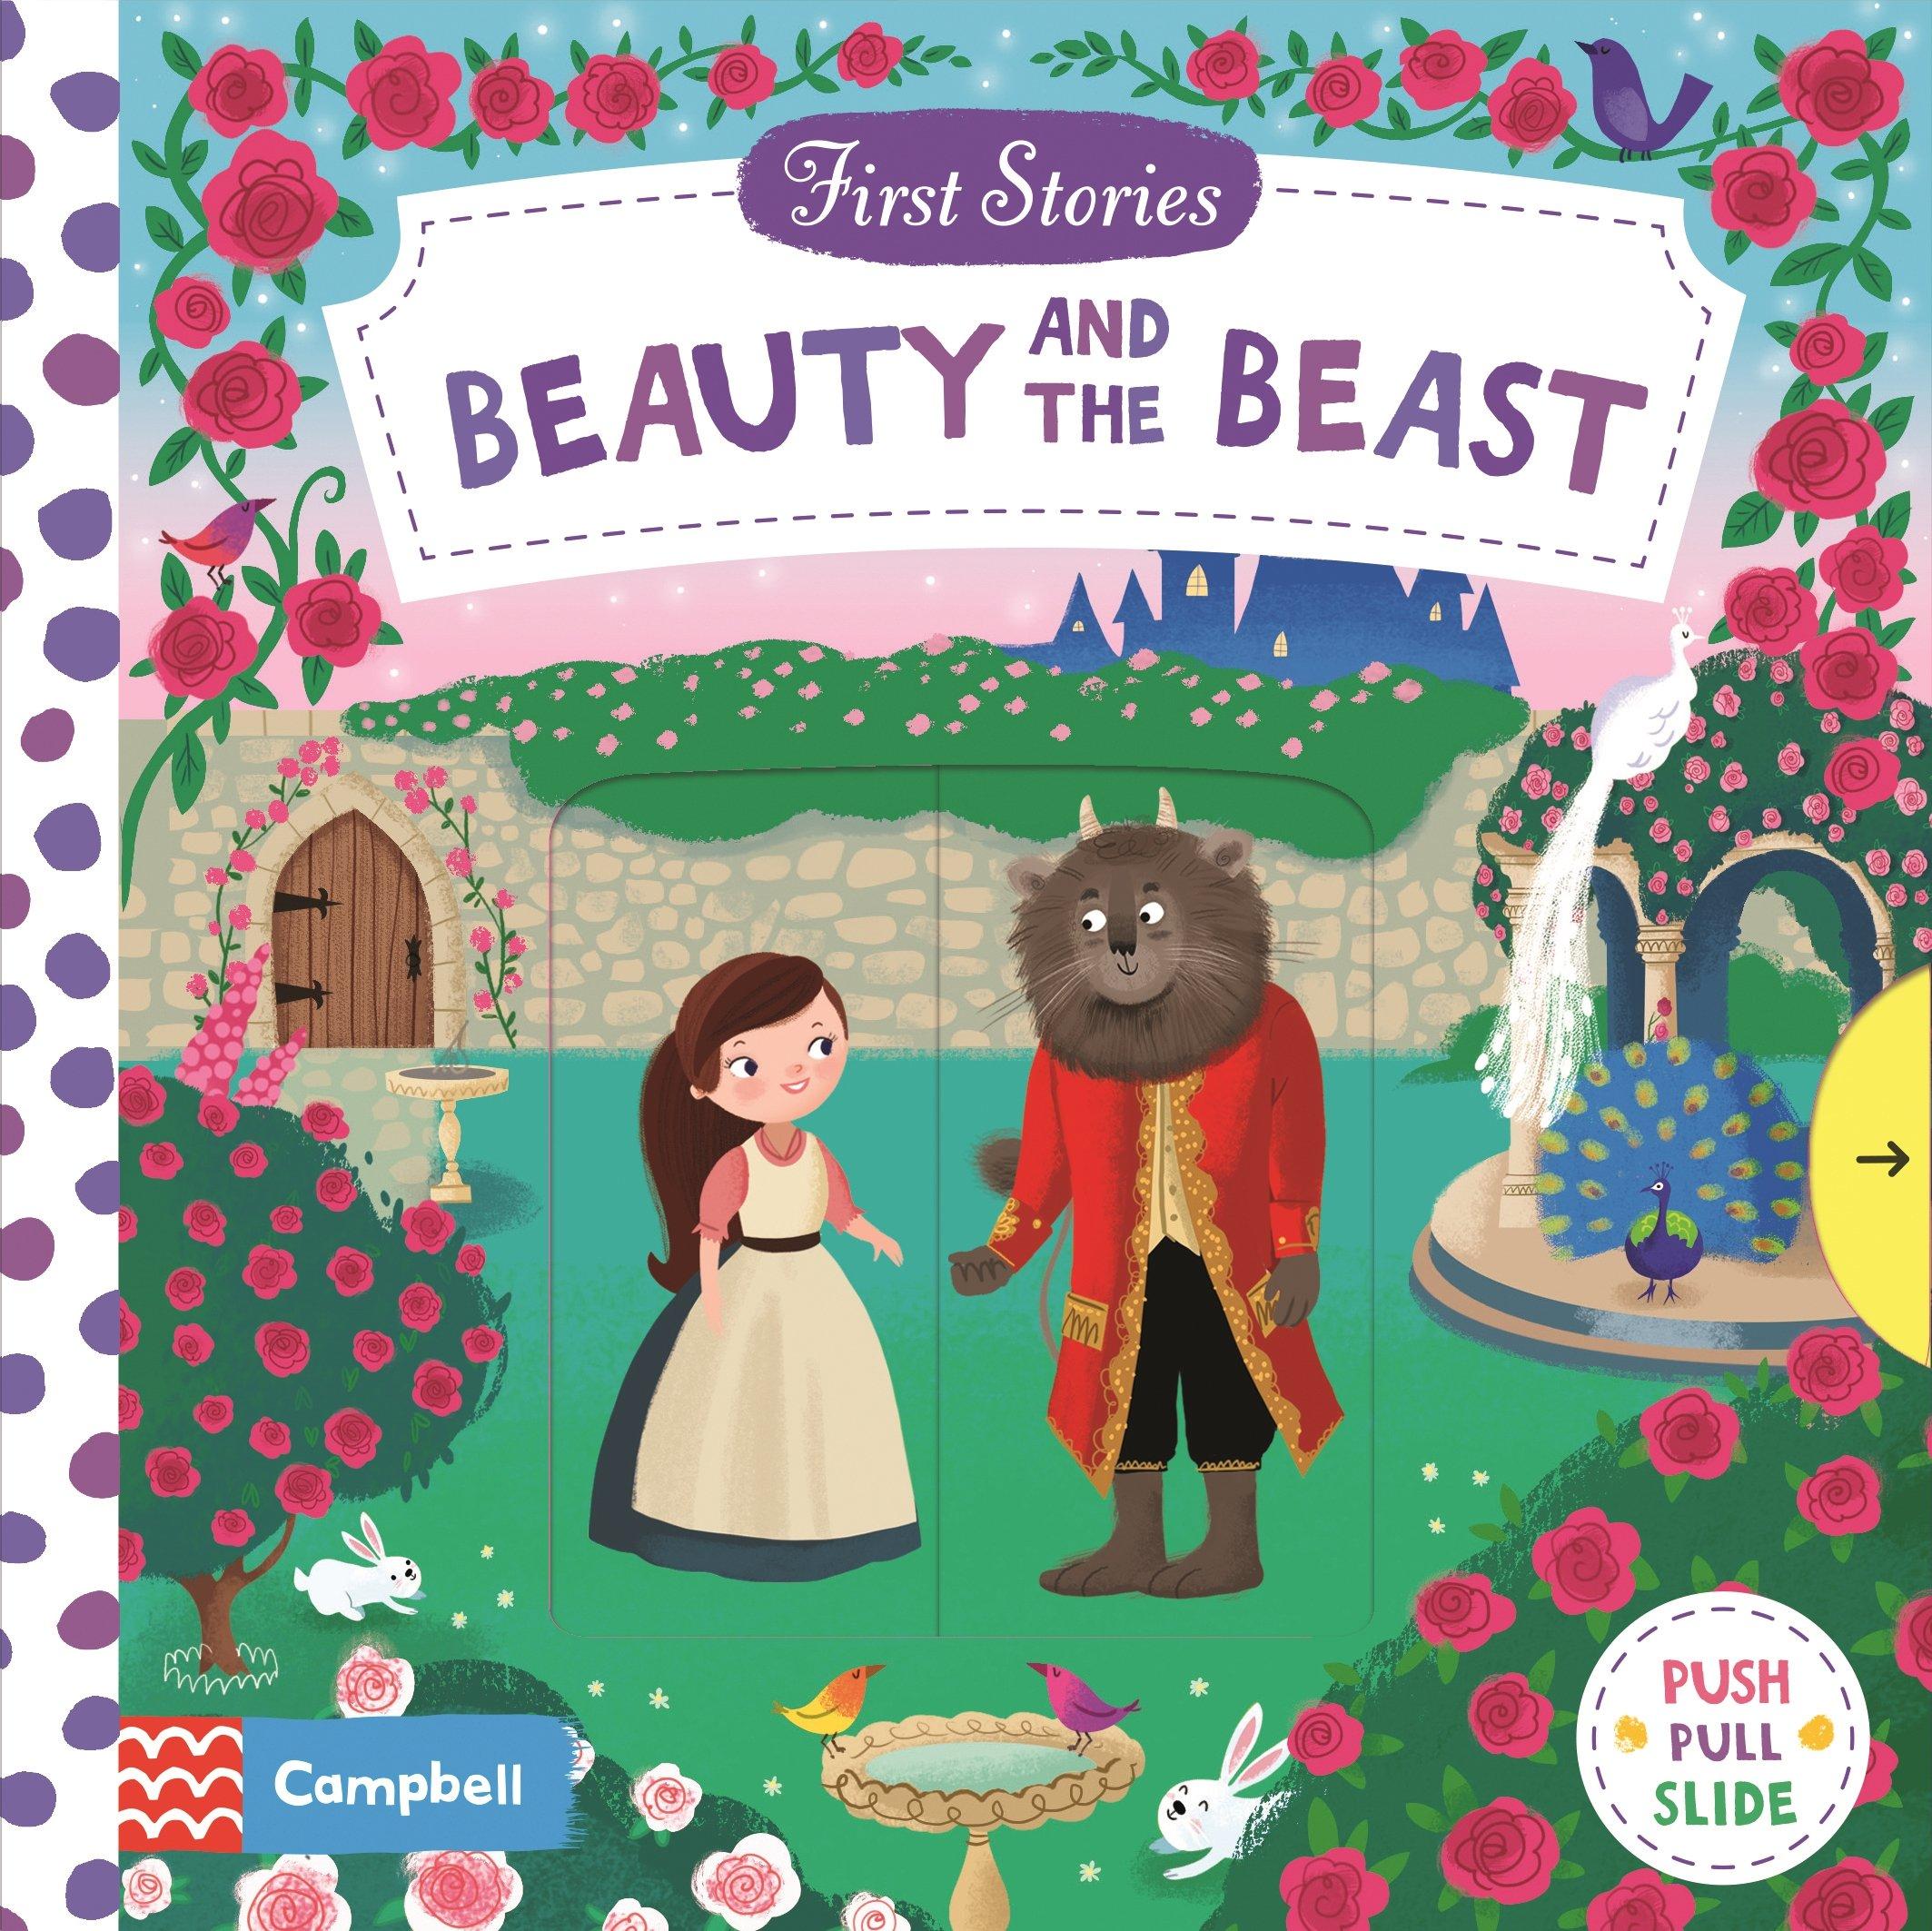 First Stories: Beauty and the Beast beauty and the beast teacher s book книга для учителя